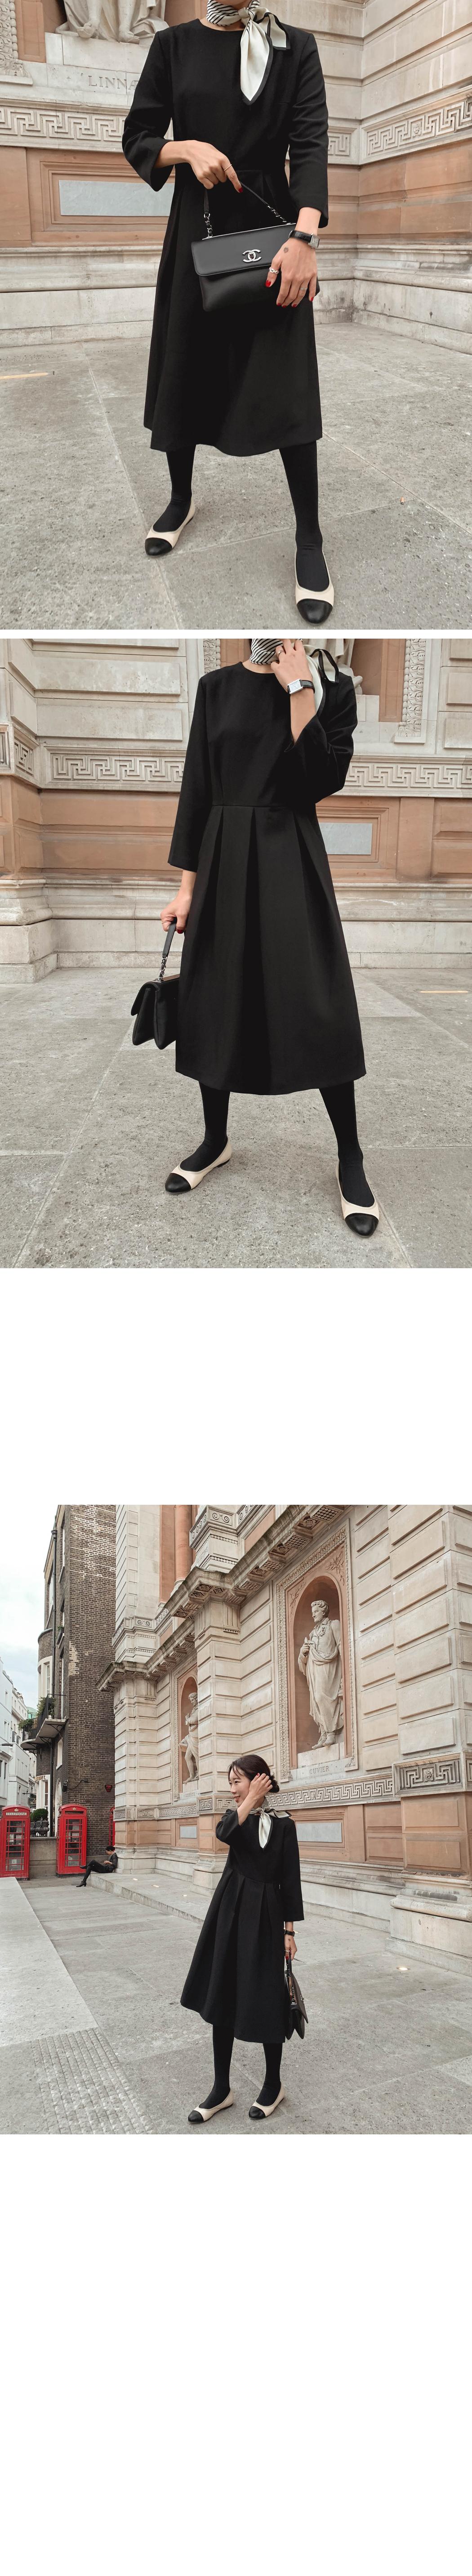 My-littleclassic/ Kelly pintuck pleated dress